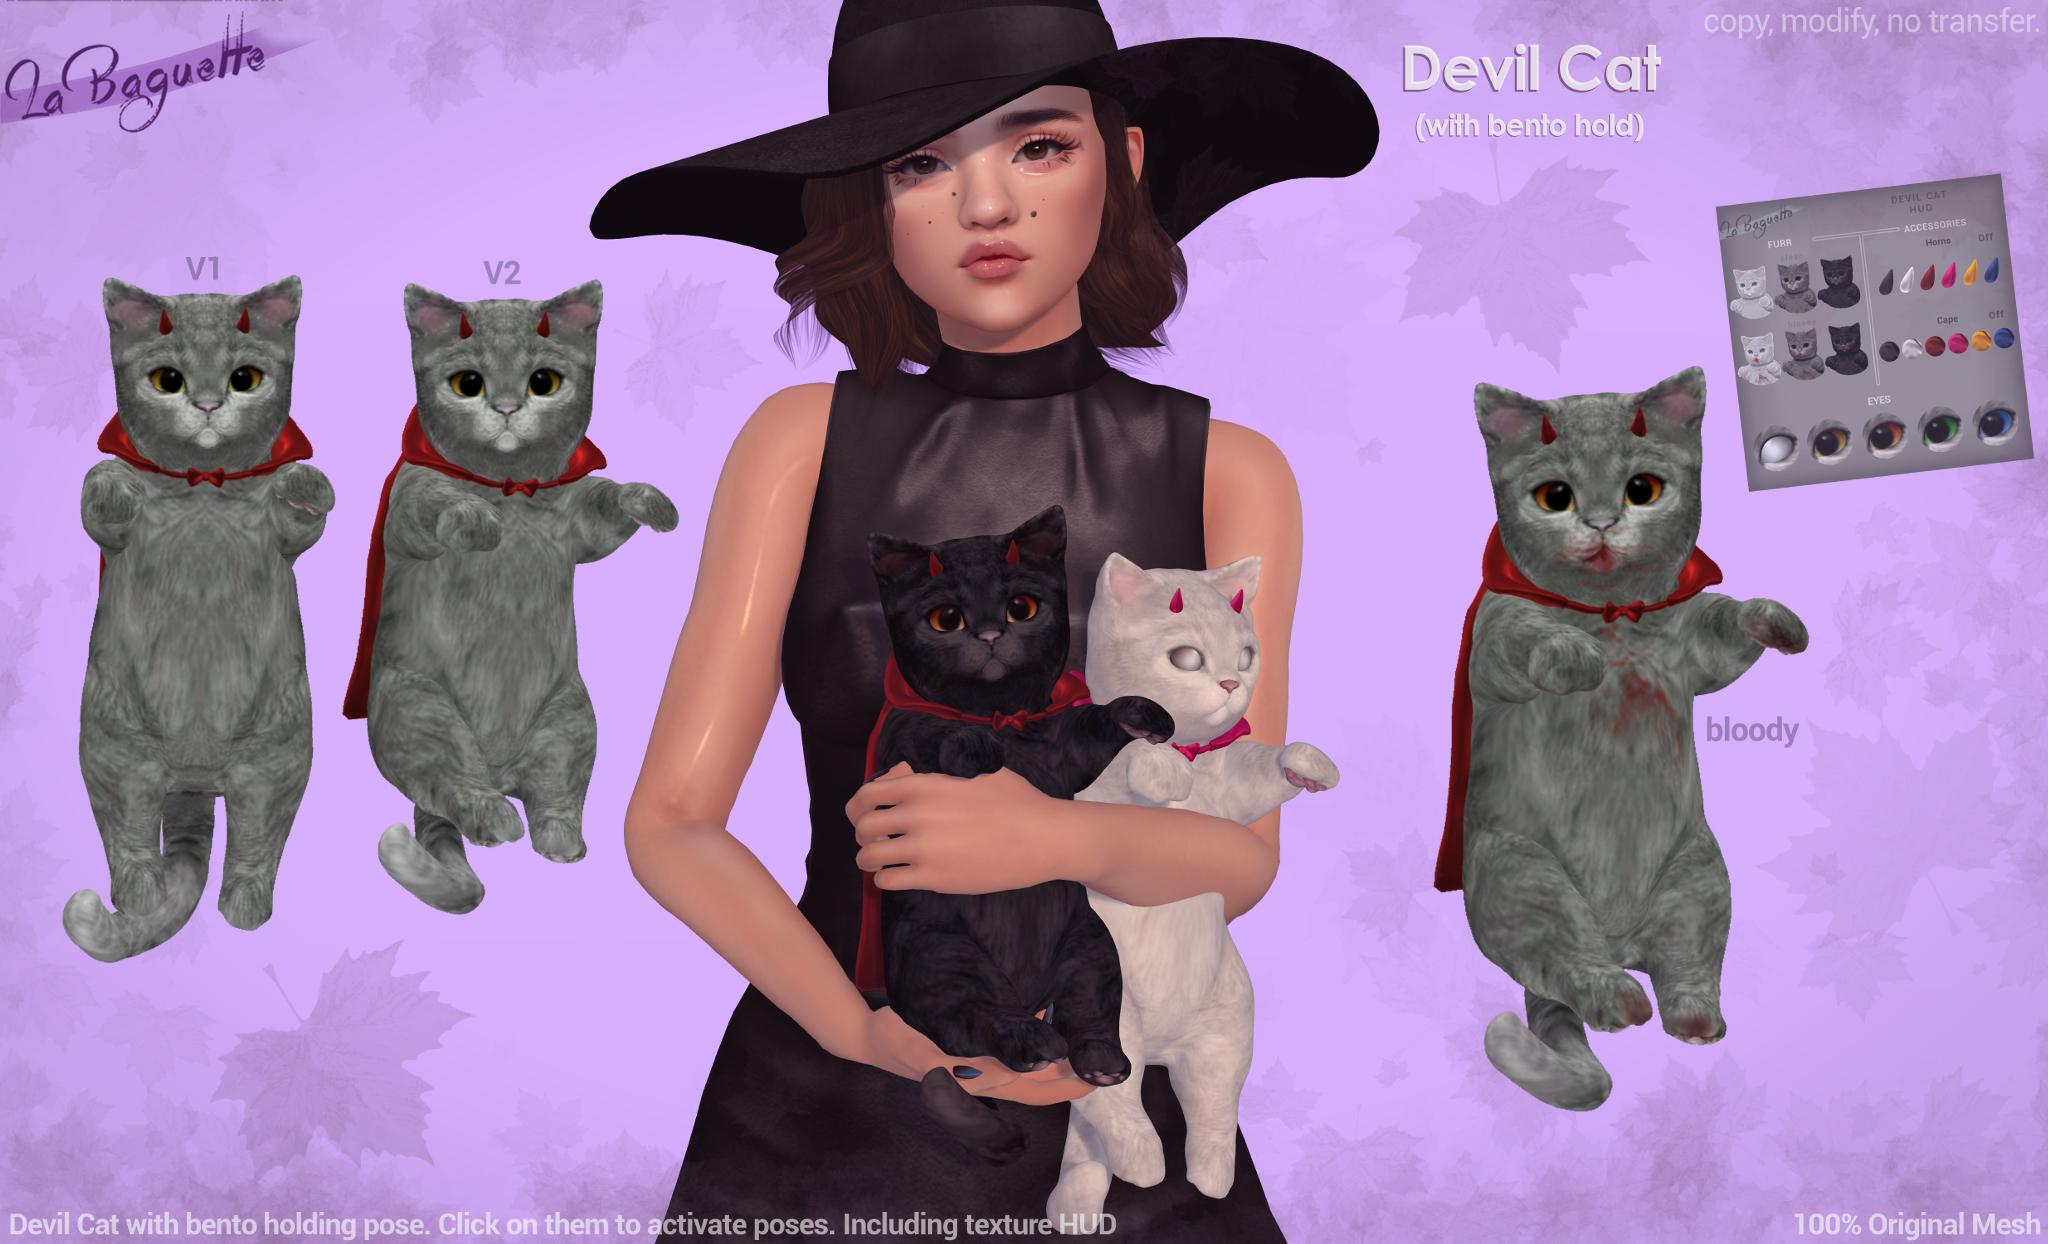 [La Baguette] Devil Cat @The  Seasons Story 2048.jpg